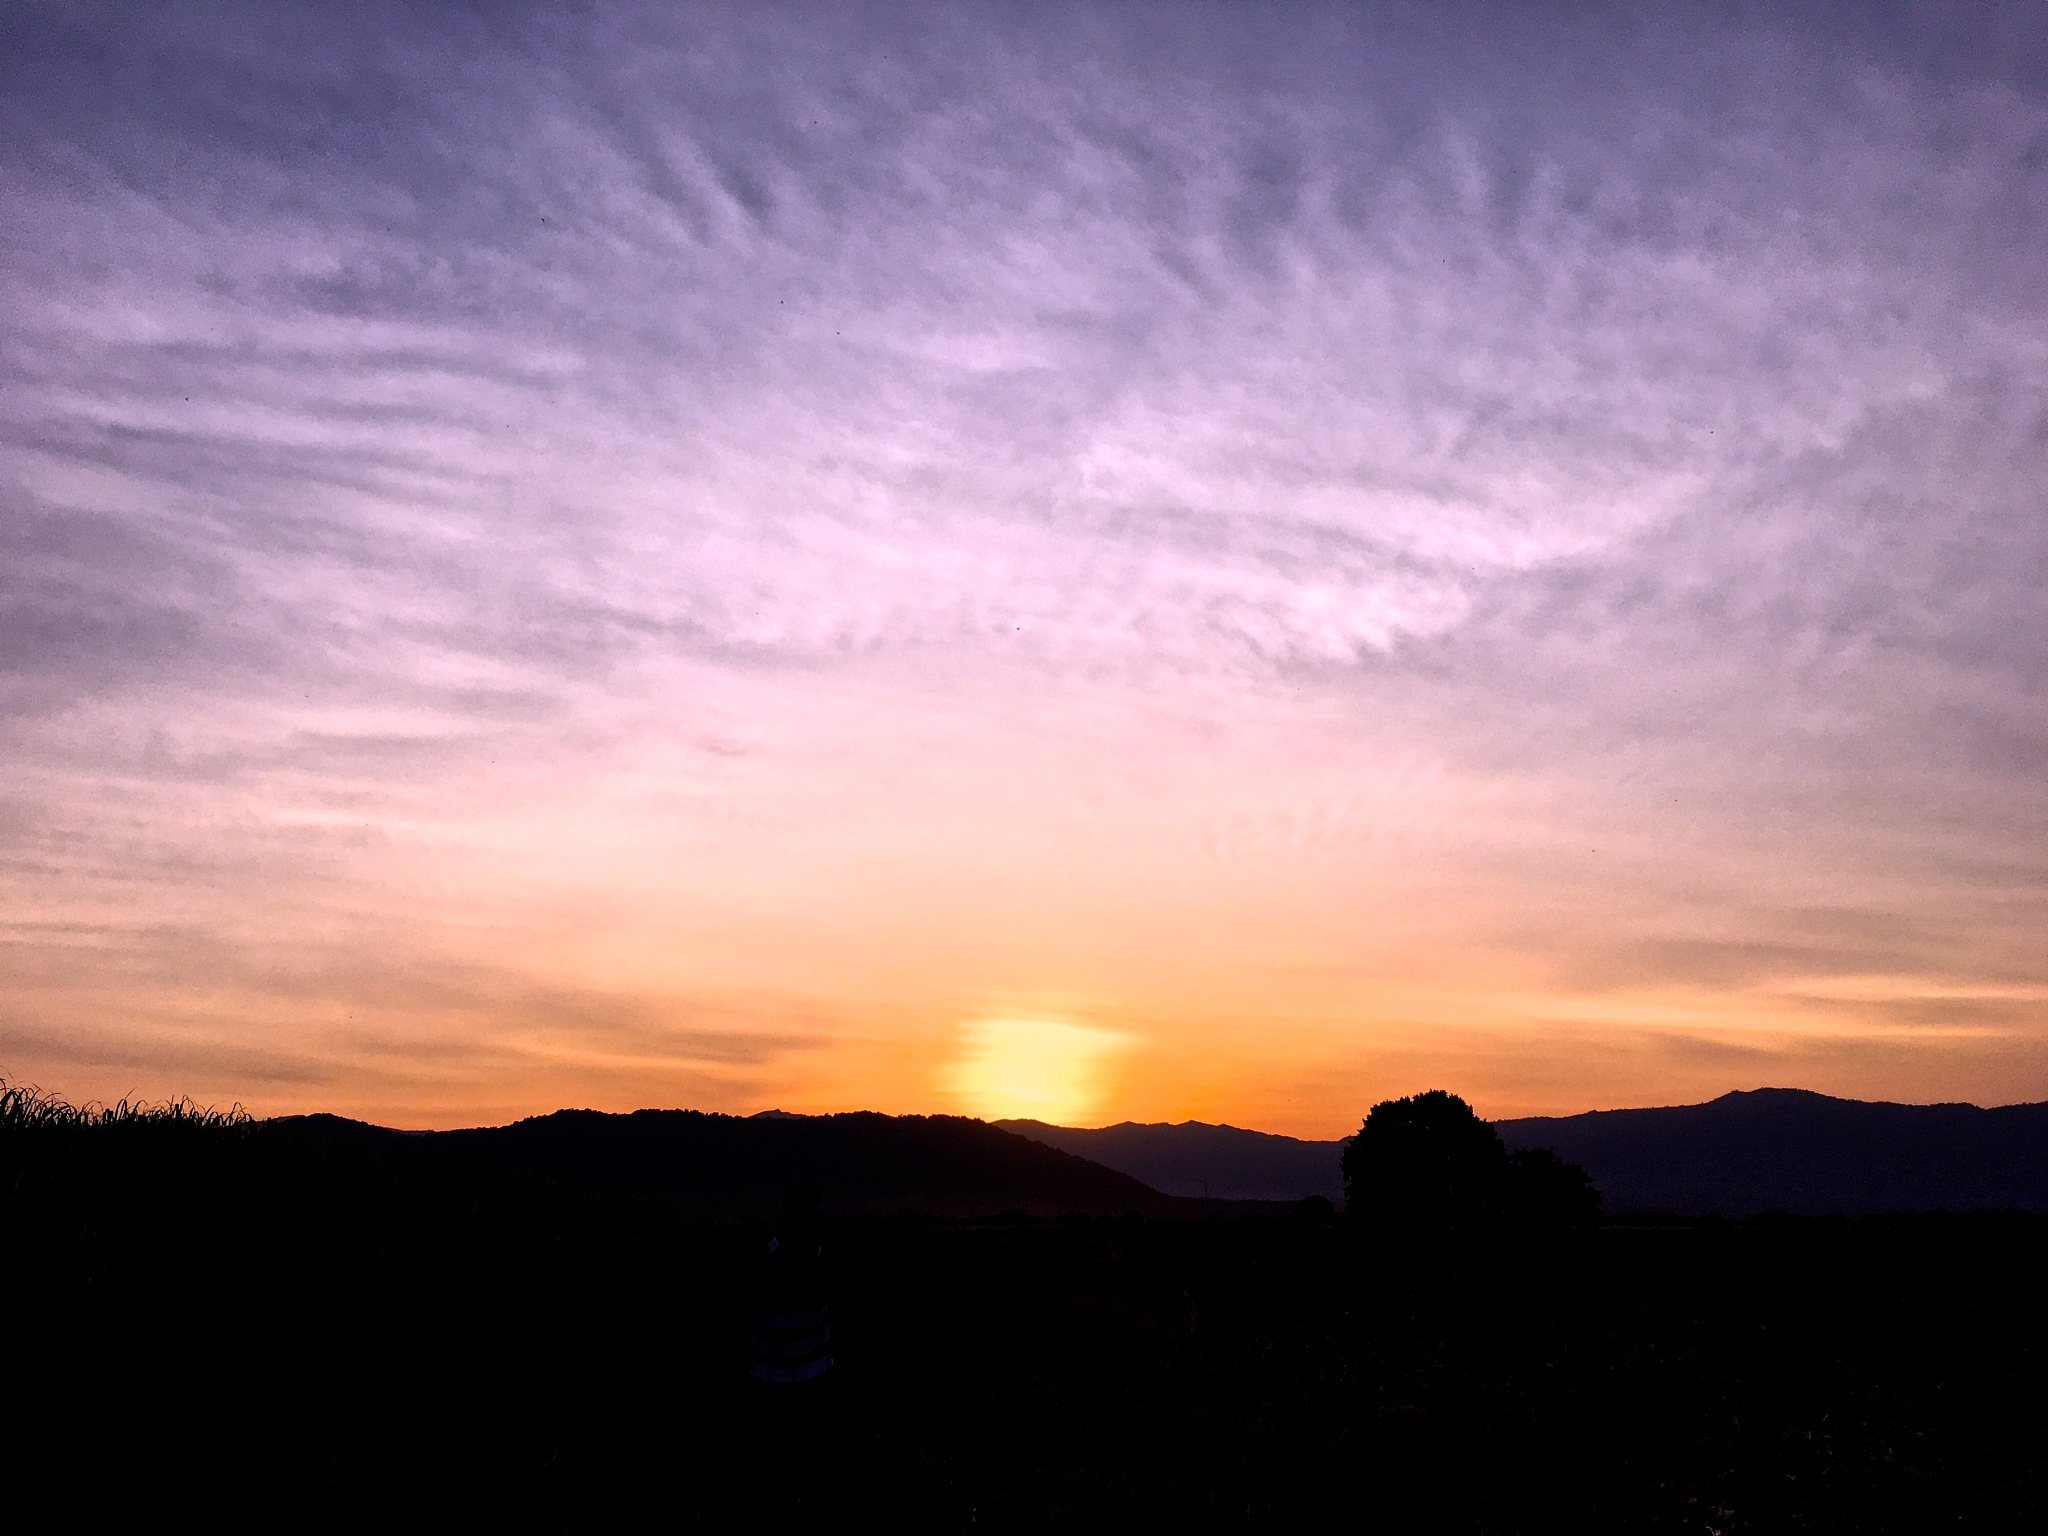 Sunset by AnjaliSisodiya